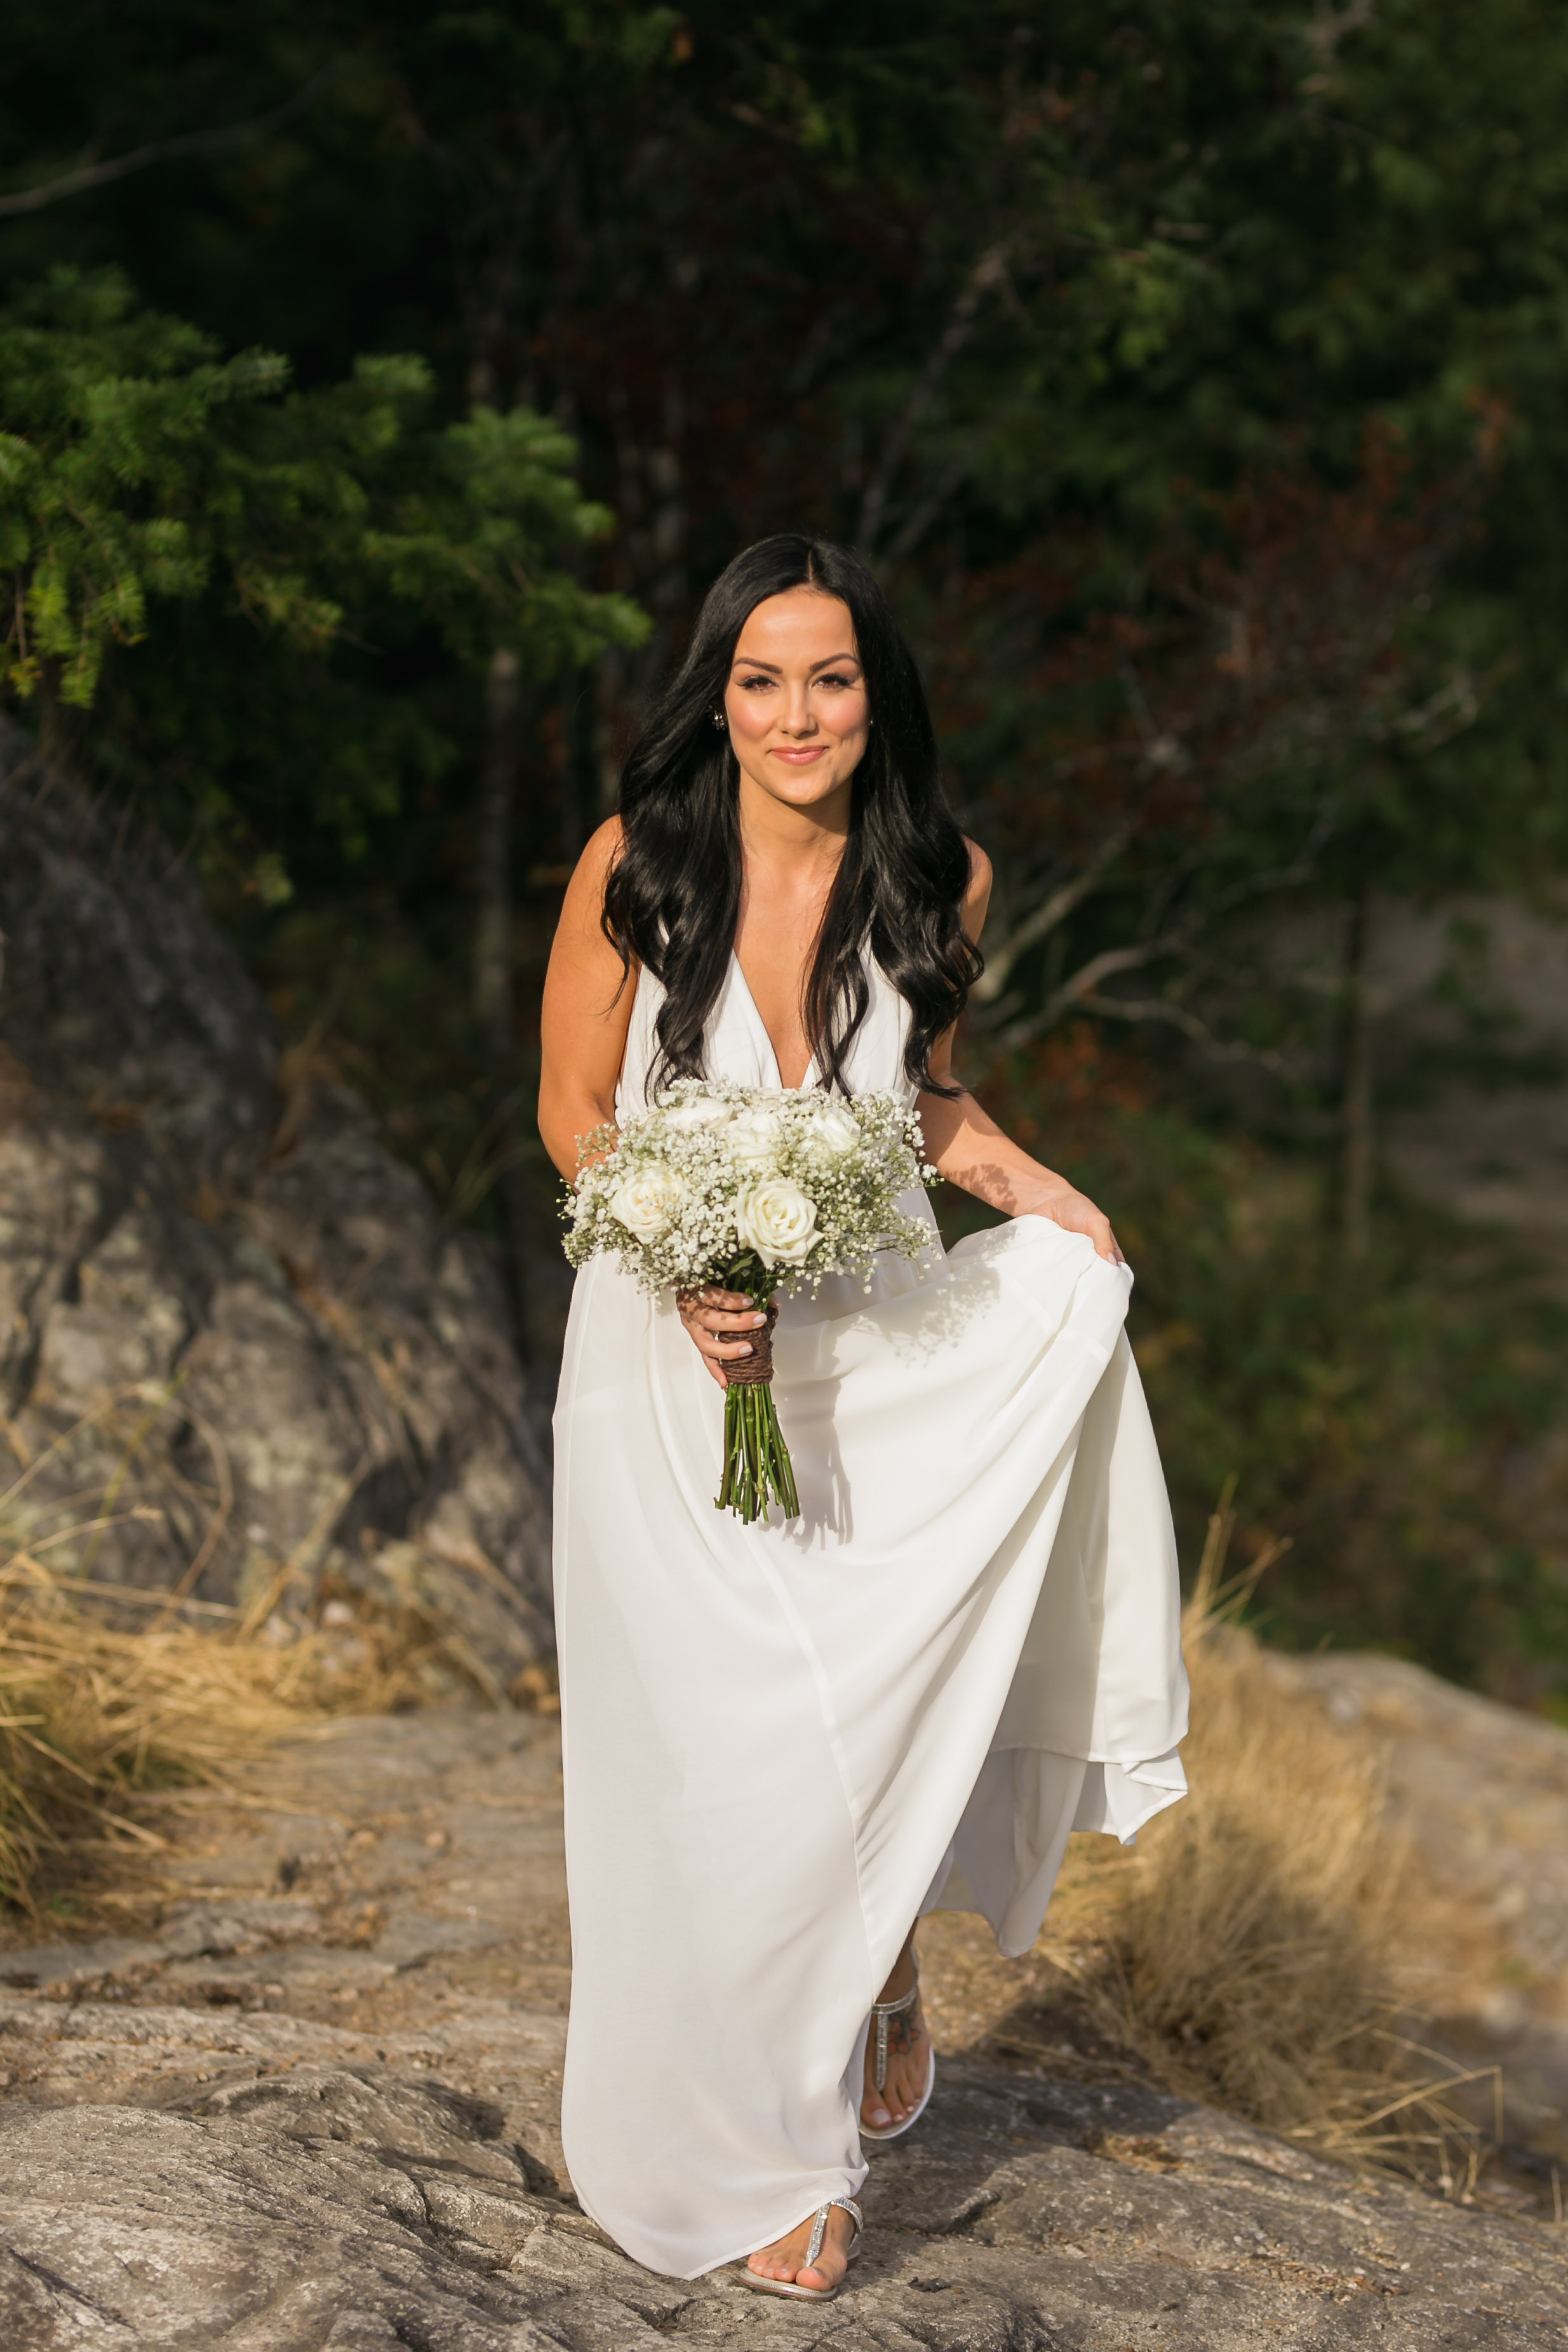 Vancouver wedding photographer Clint Bargen Photography